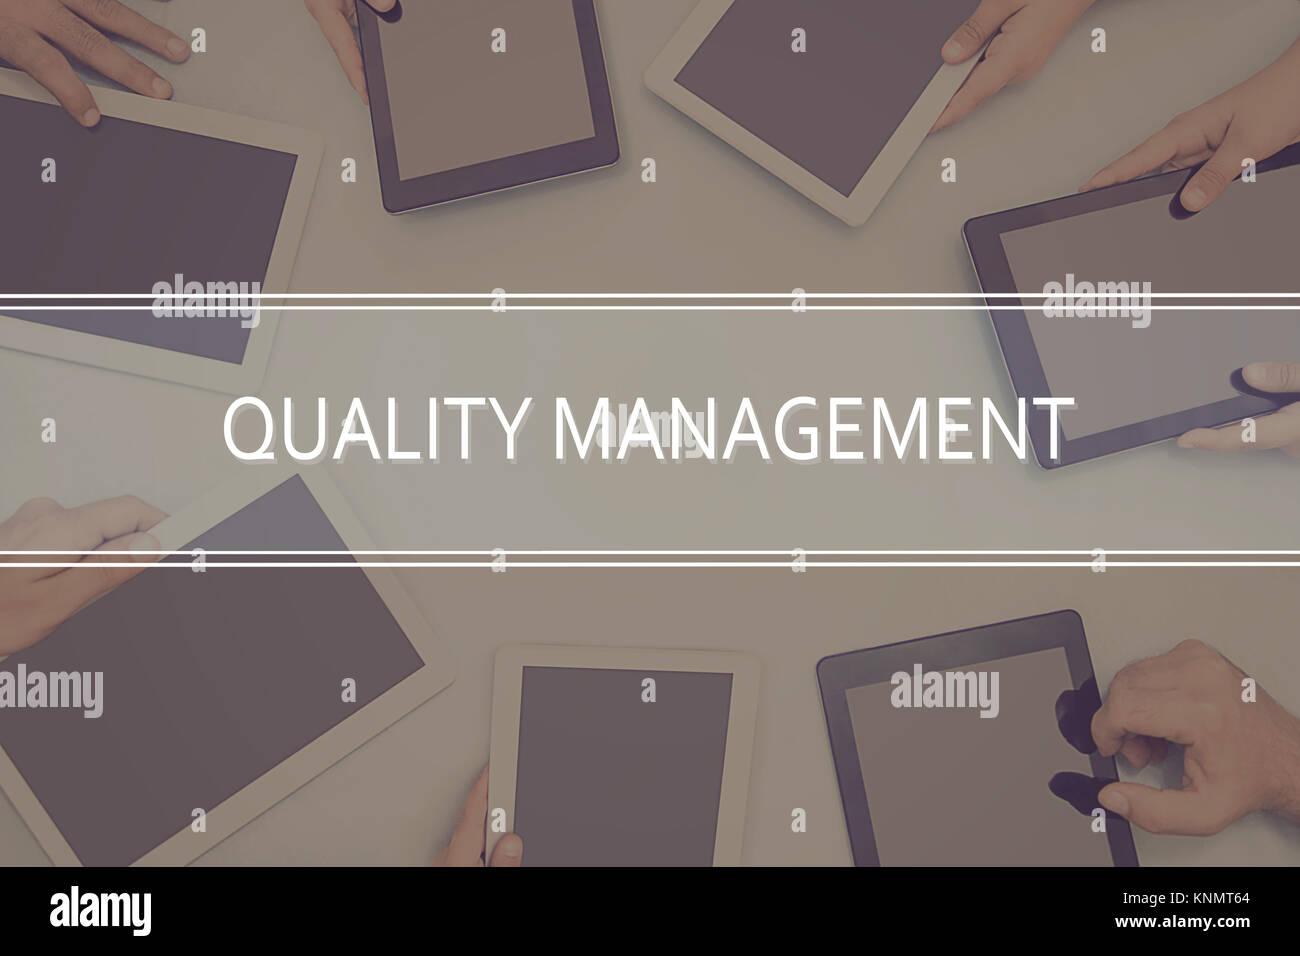 QUALITY MANAGEMENT CONCEPT Business Concept. - Stock Image